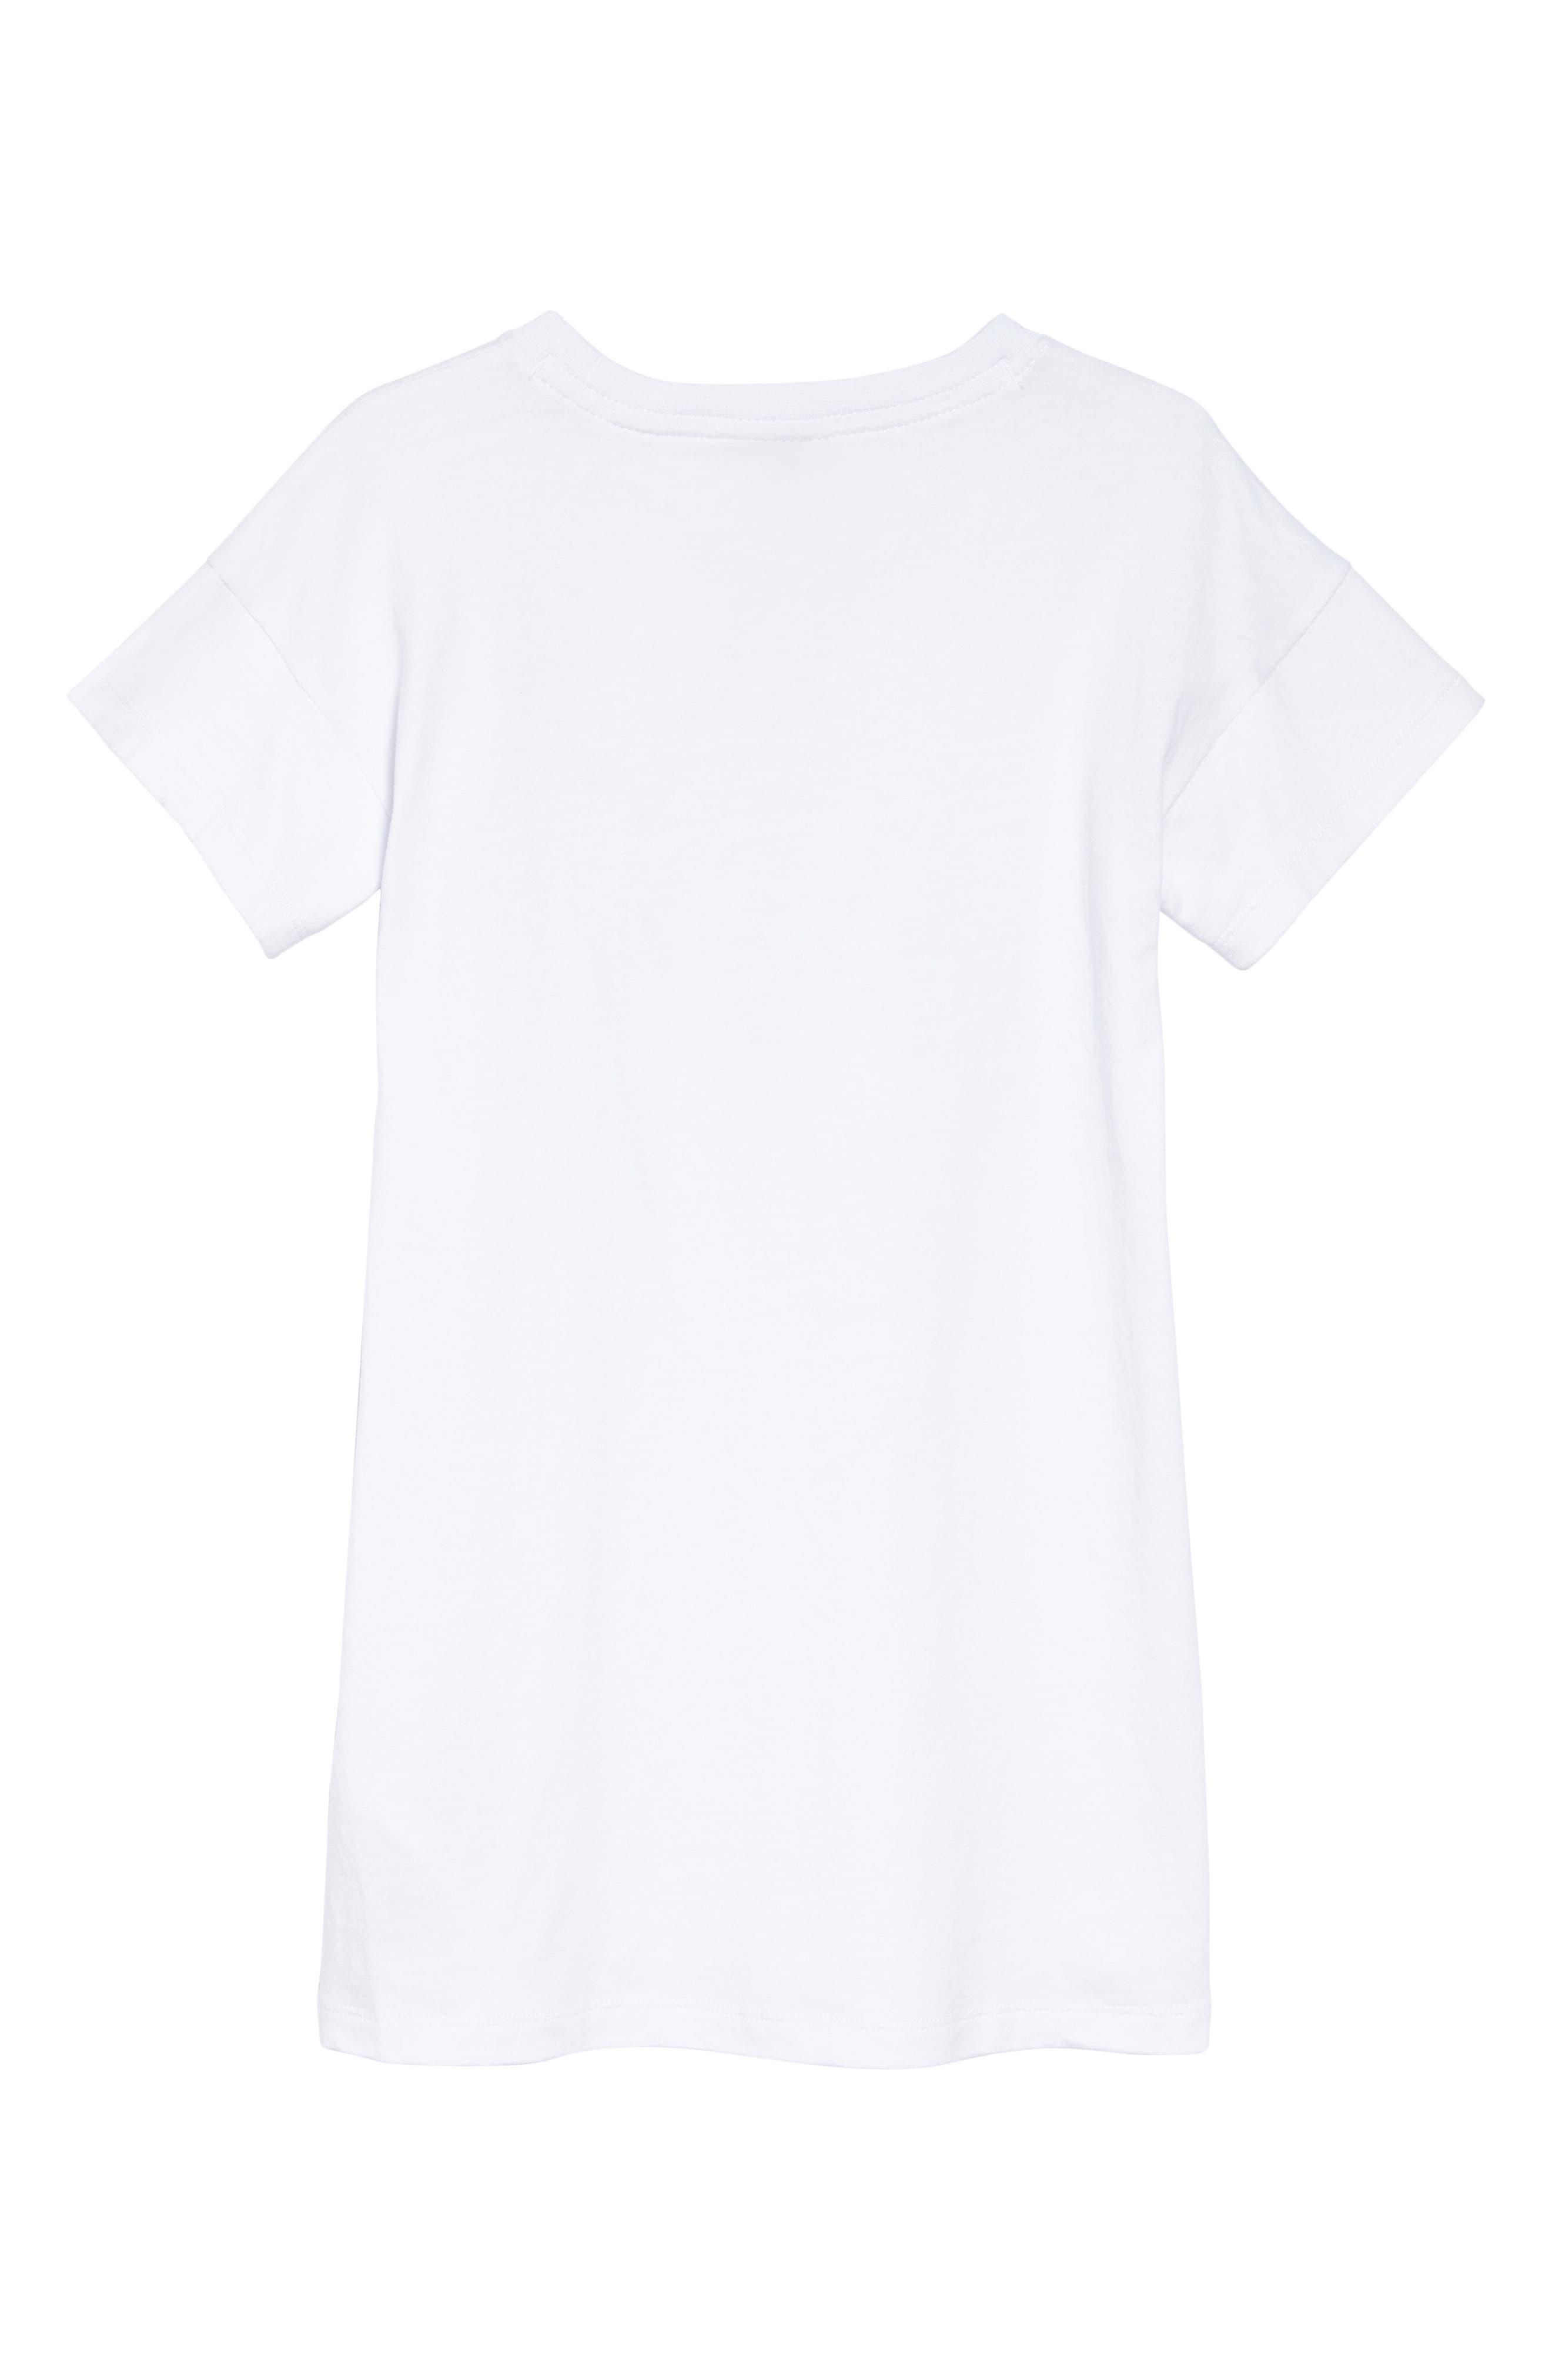 Alternate Image 3  - Nike Futura T-Shirt Dress (Toddler Girls & Little Girls)